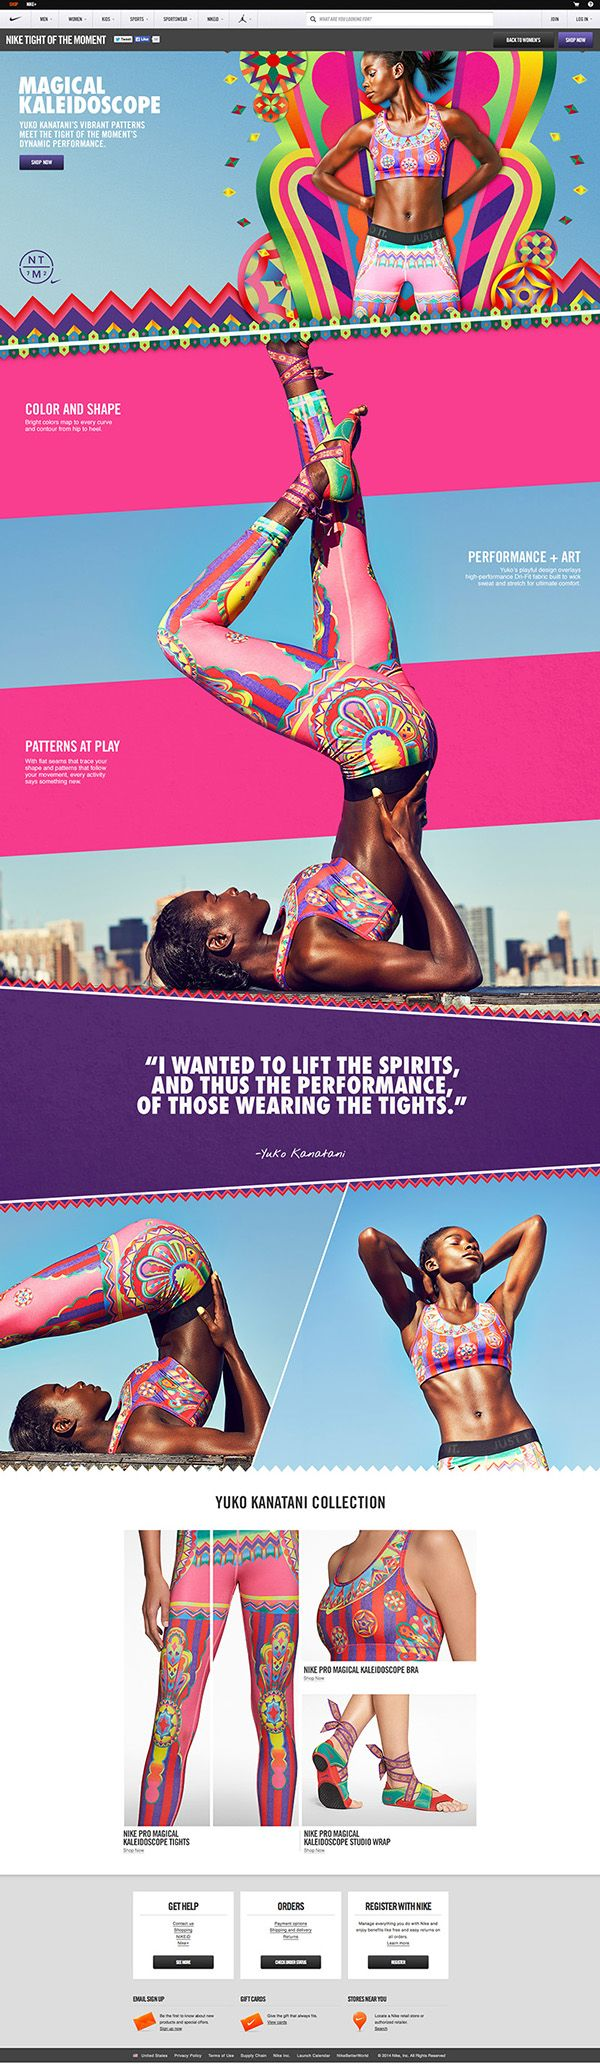 Nike: Tights of the Moment  by Mariola Bruszewska, via Behance #webdesign #fresh